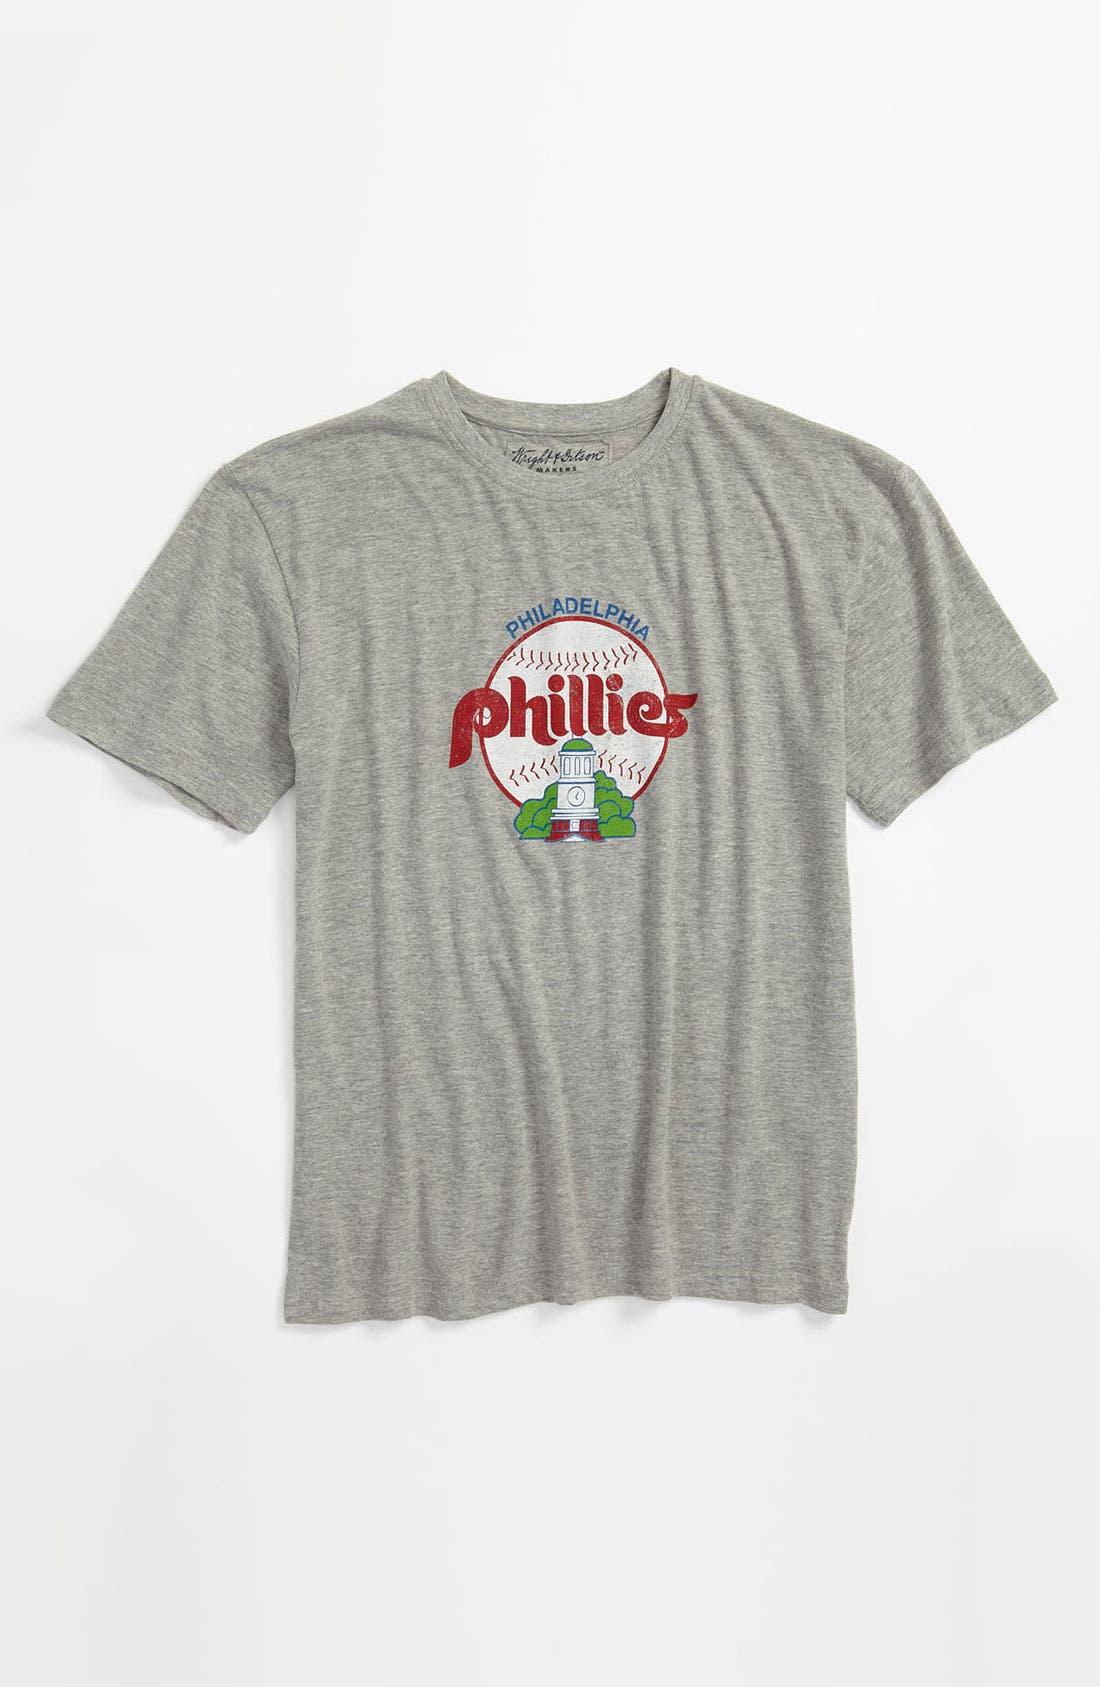 Main Image - Wright & Ditson 'Philadelphia Phillies' T-Shirt (Little Boys & Big Boys)